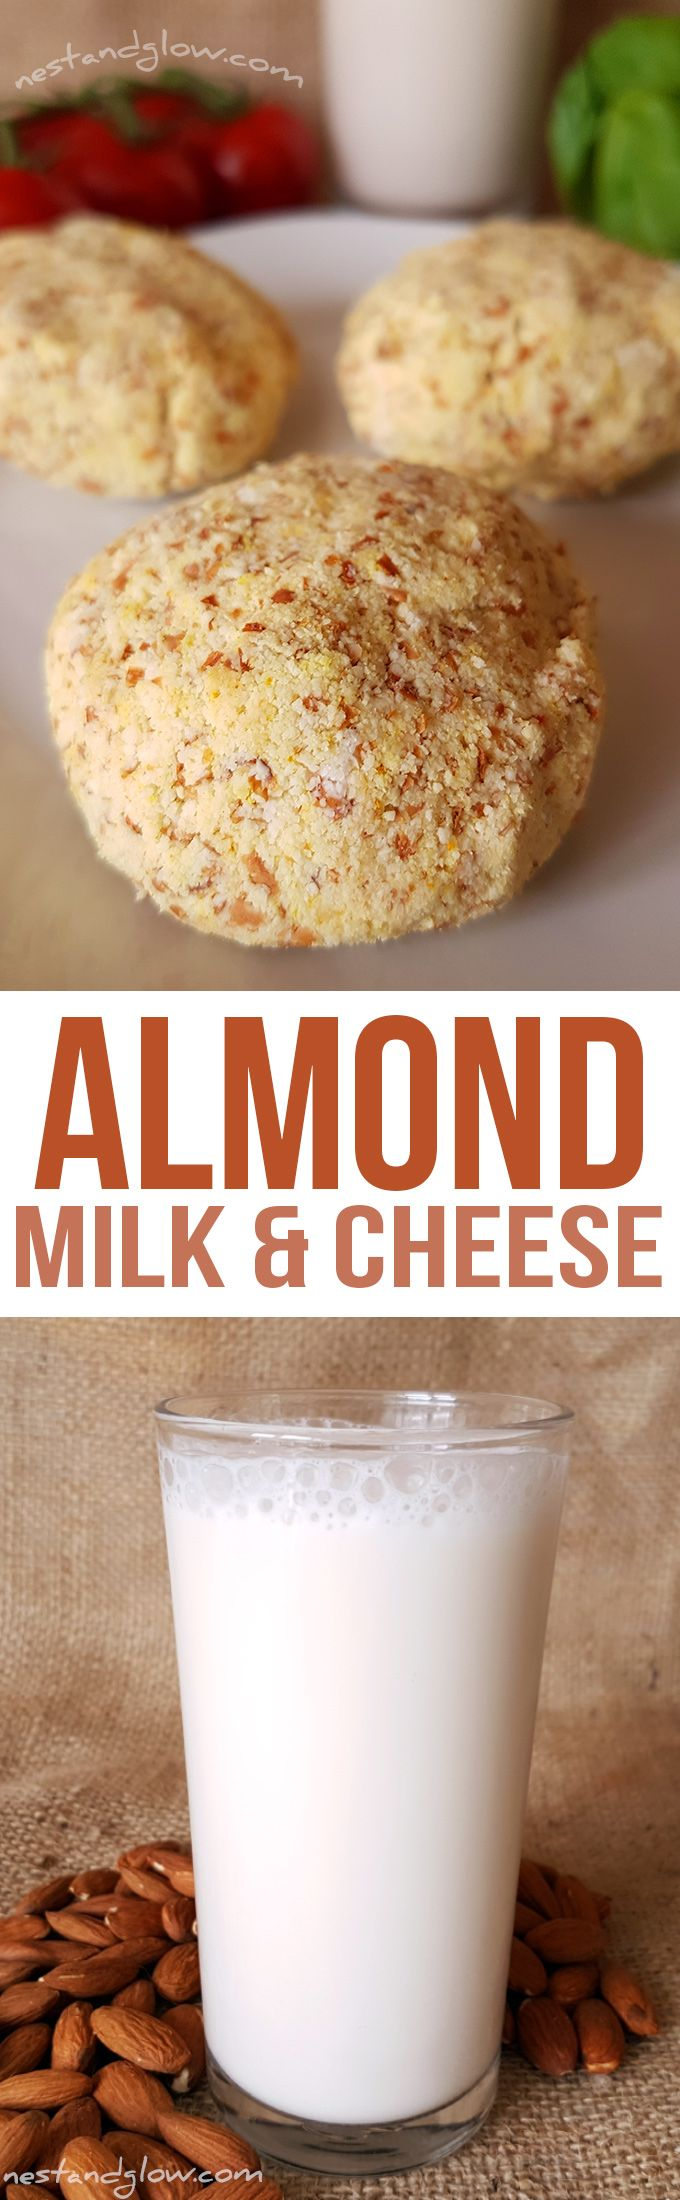 Almond Milk and Almond Pulp Cheese Recipes via @nestandglow